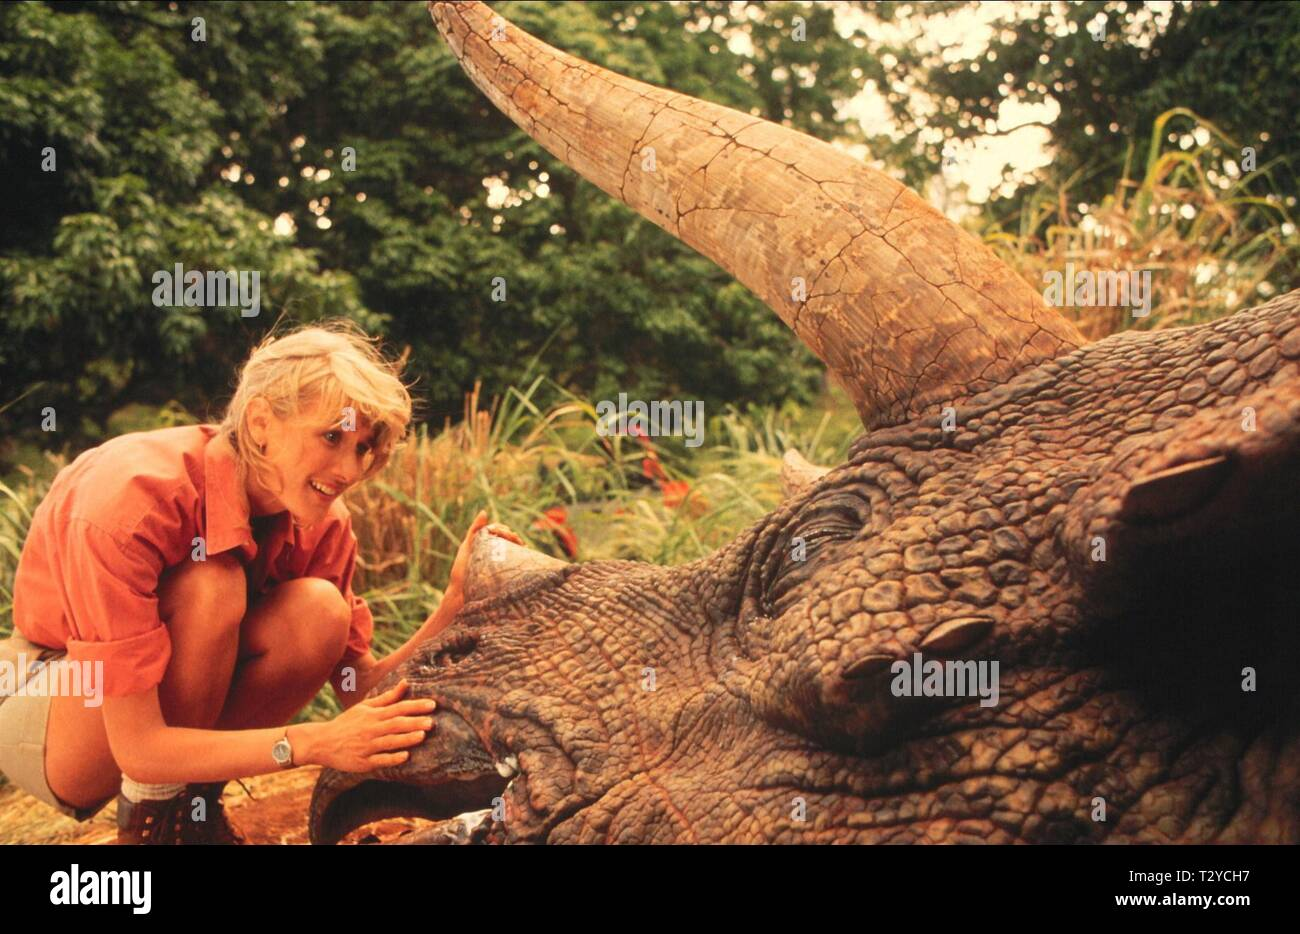 LAURA DERN, JURASSIC PARK, 1993 - Stock Image